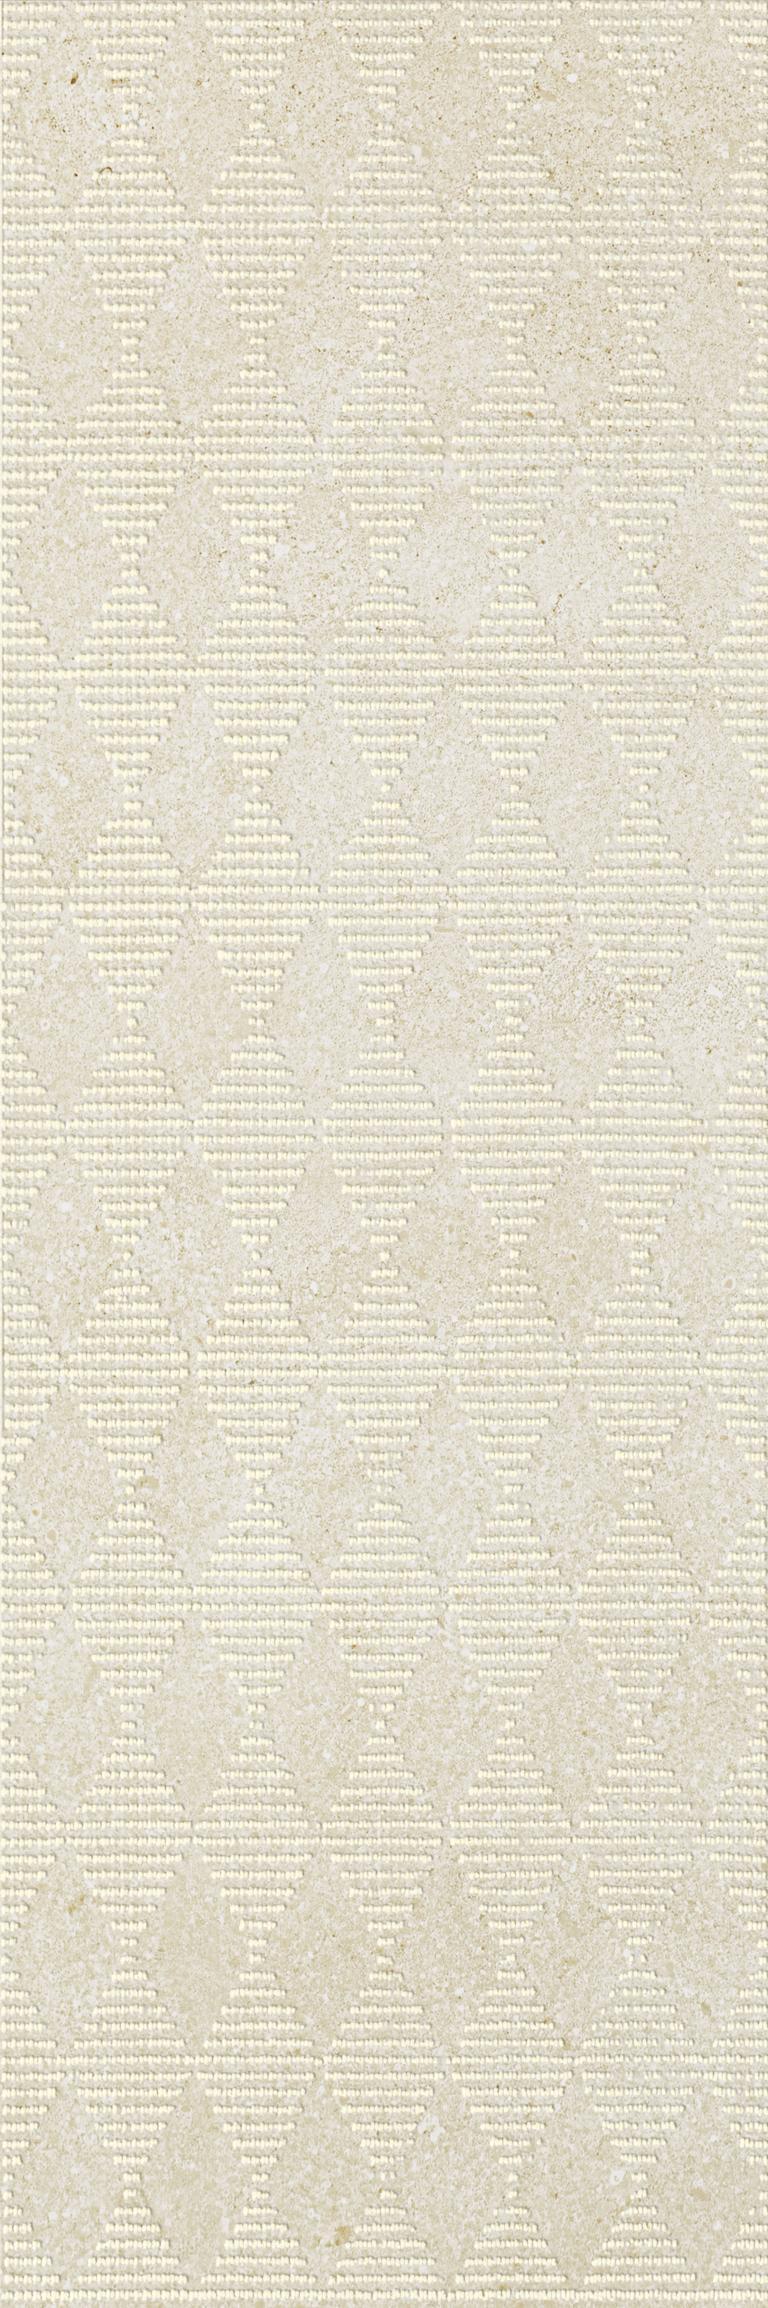 nomada crema inserto geometryk be owy 325x977 wanddekorationen ceramika paradyz. Black Bedroom Furniture Sets. Home Design Ideas